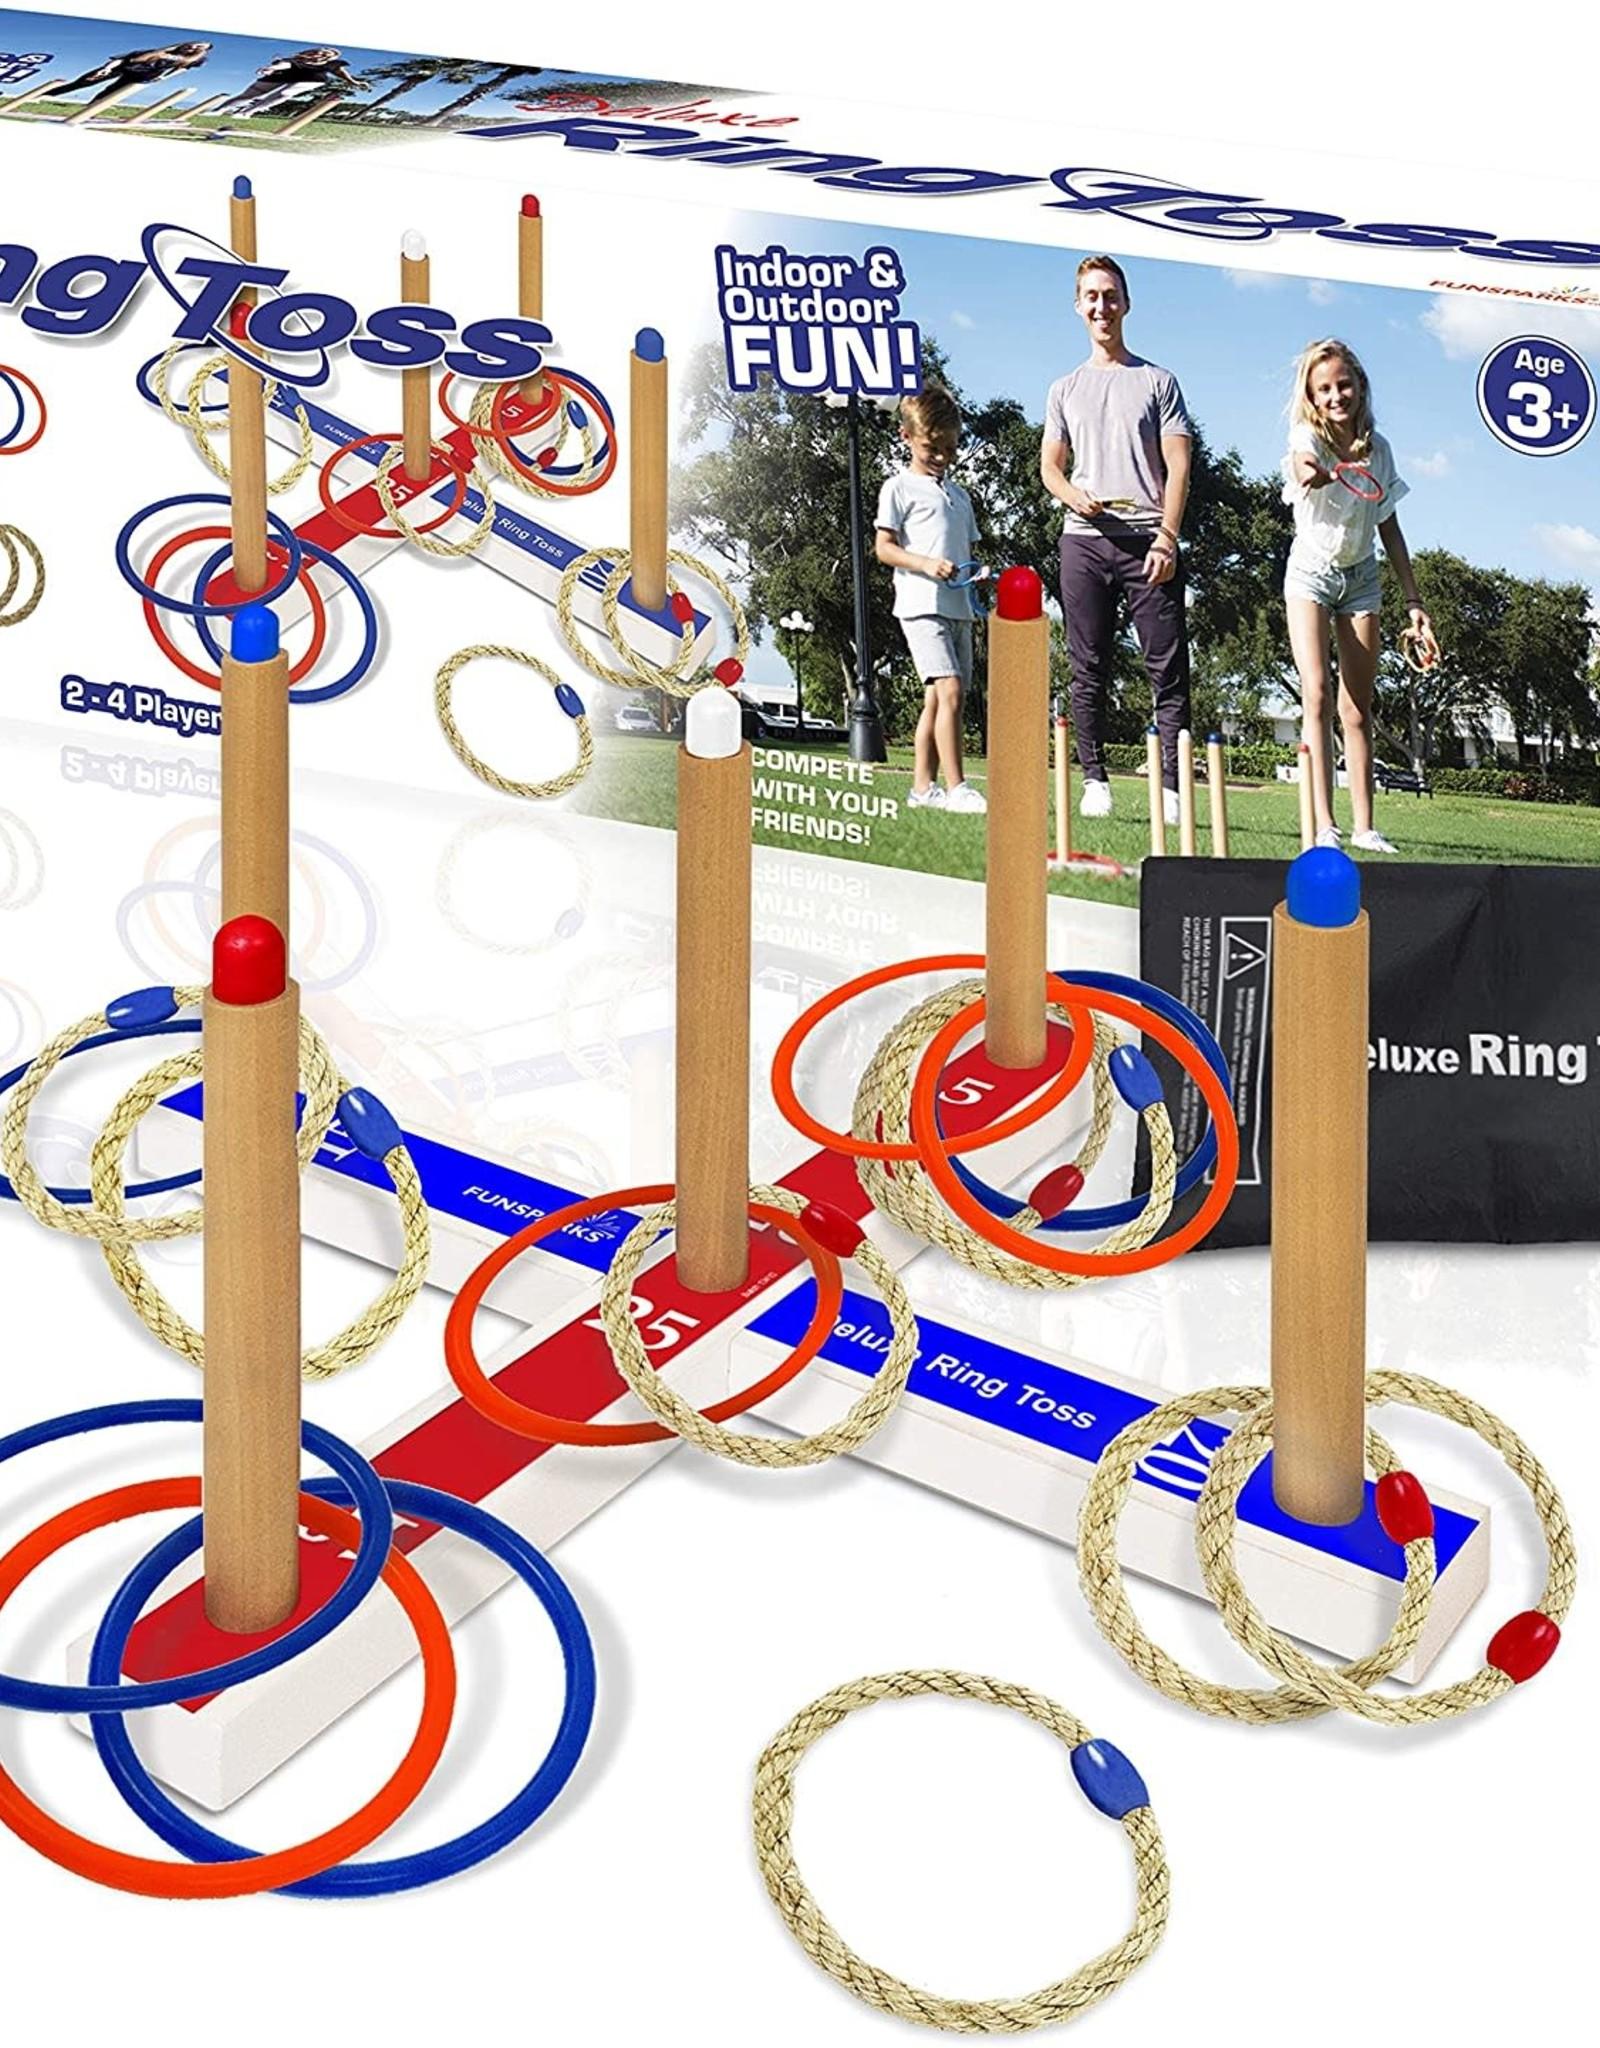 Funsparks Ring Toss Deluxe